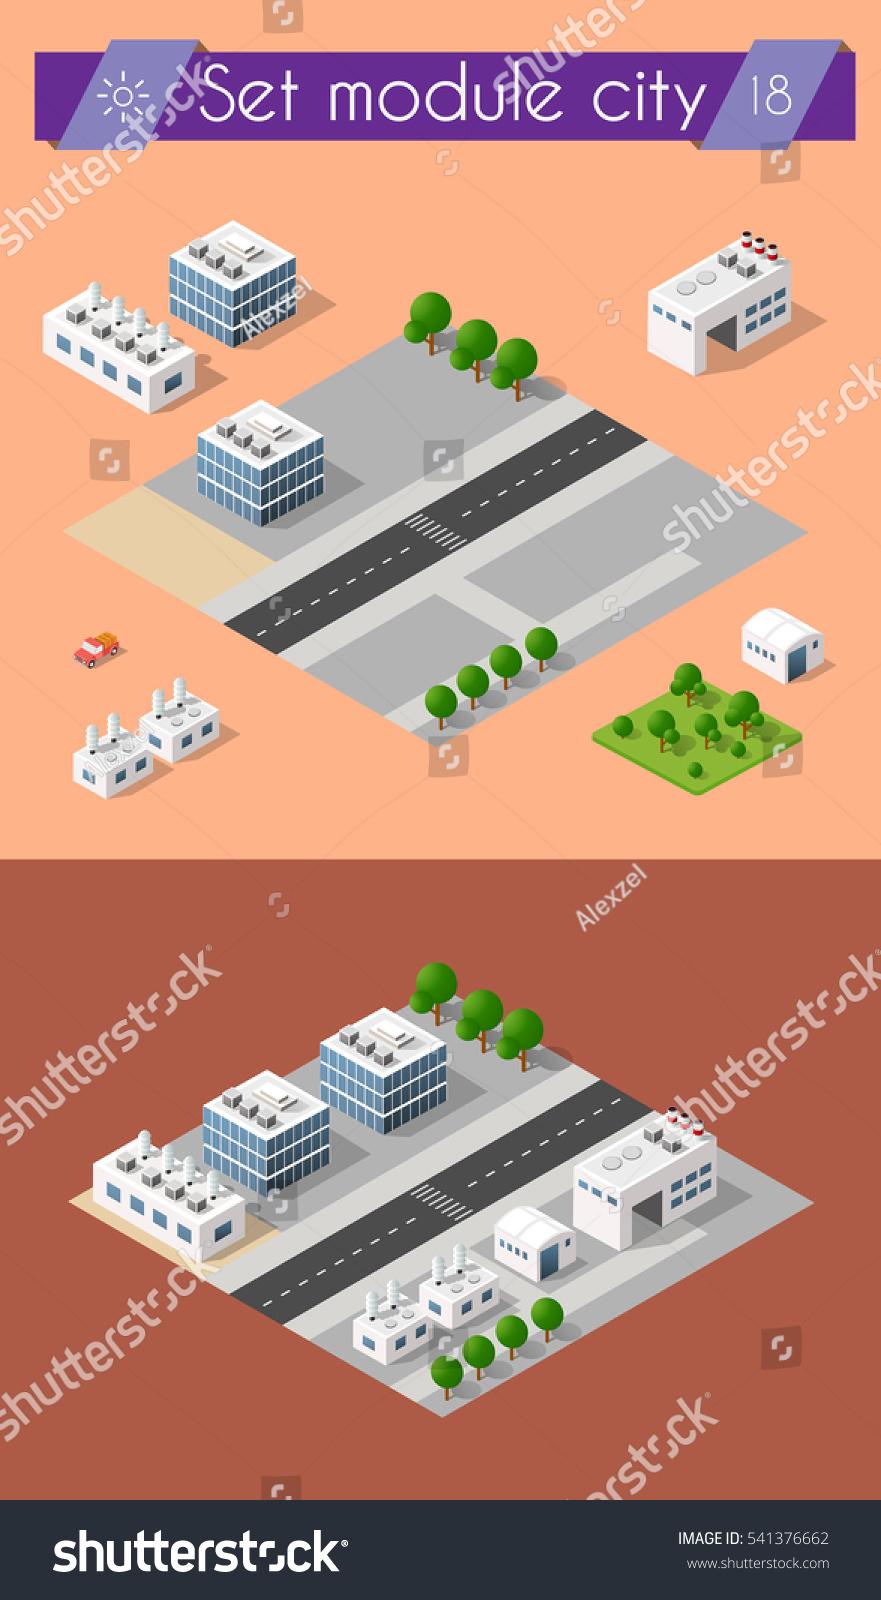 City Map Generator zip code map san antonio D City Map Generator on